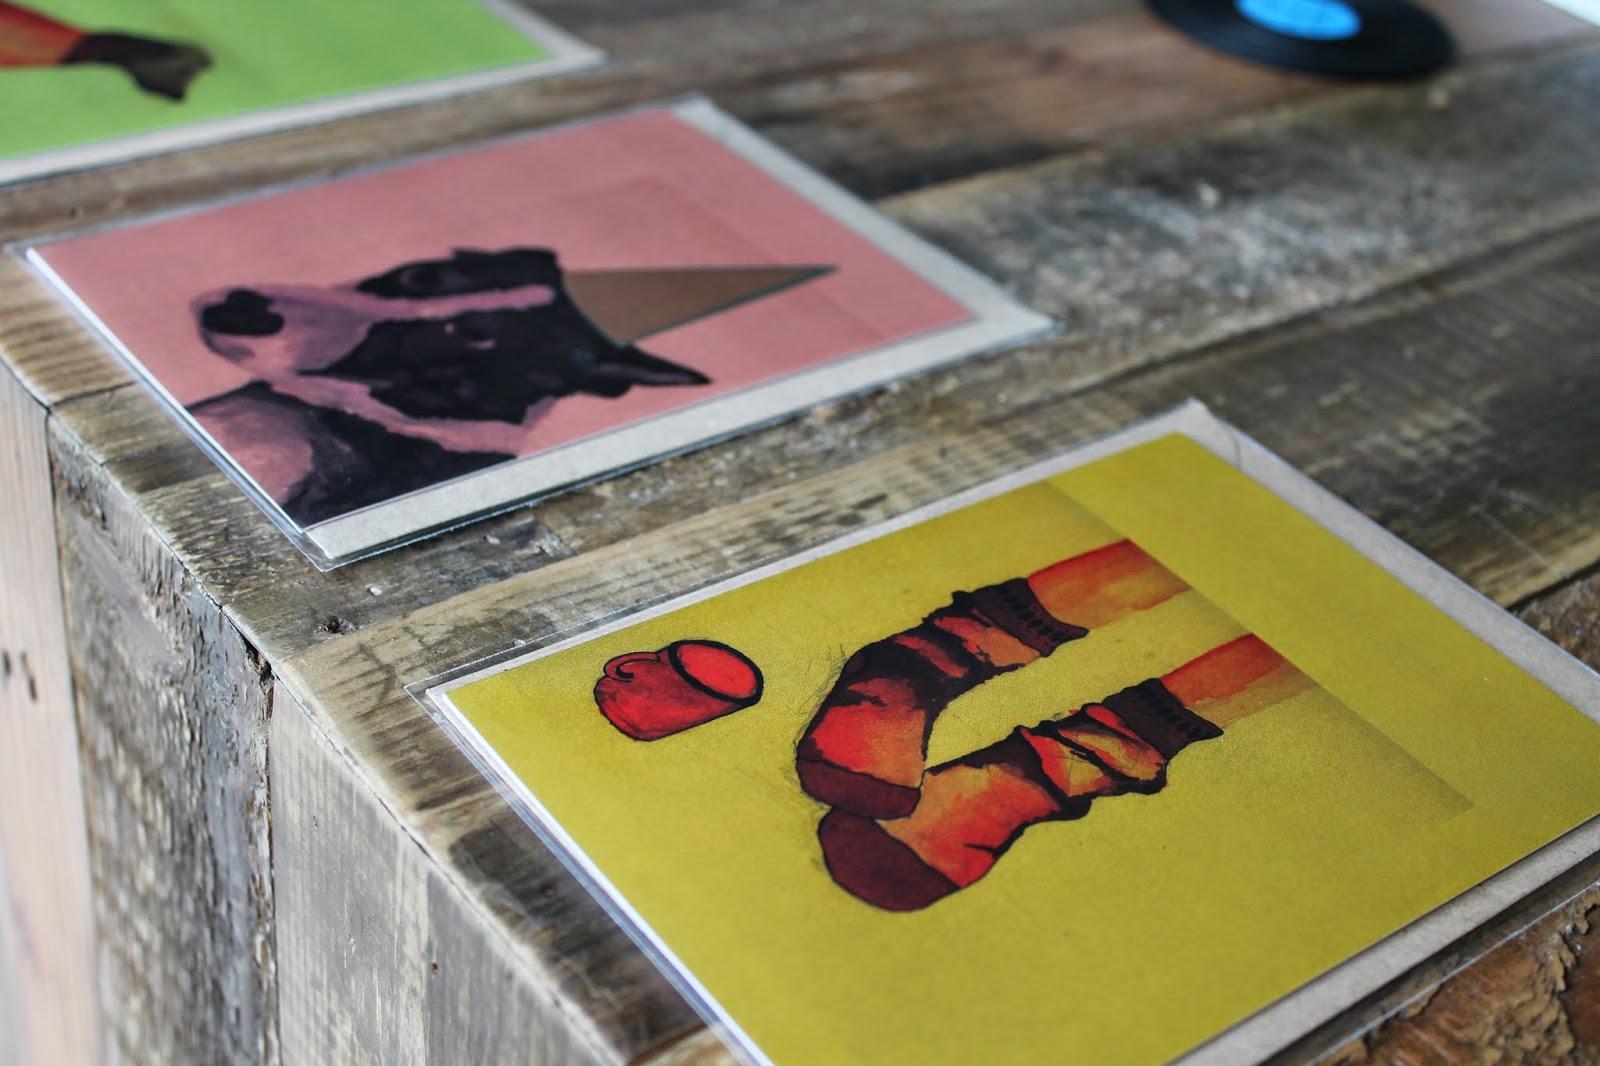 Plewsy Studio - Fiona Plews - Handmade Ilustrations Cards Prints